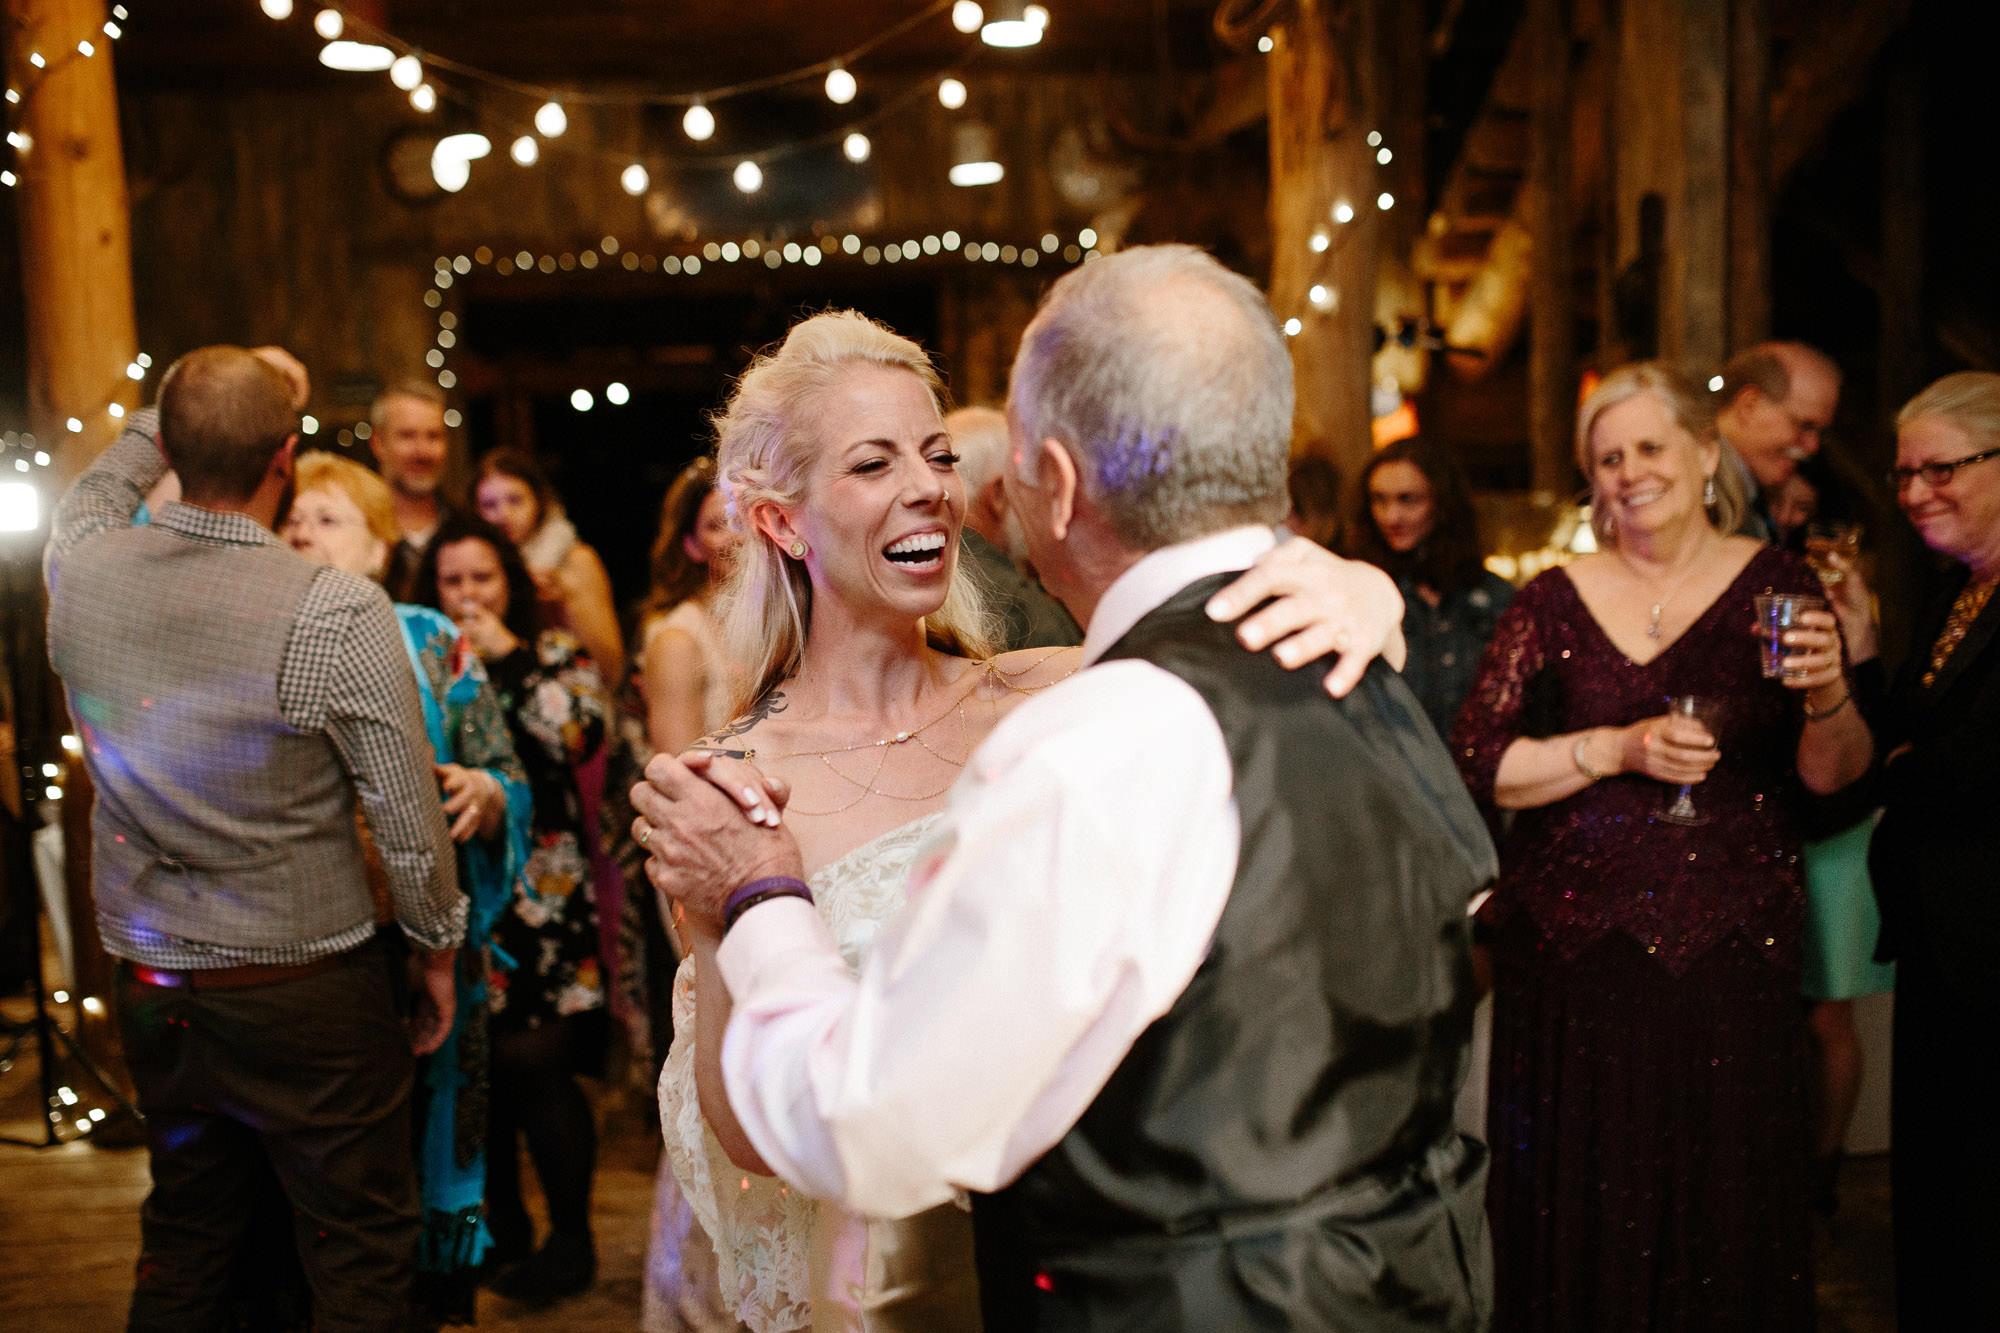 bucci-barn-wedding-elopement-evergreen-boulder-denver-colorado-adventerous-romantic-timeless-114.jpg